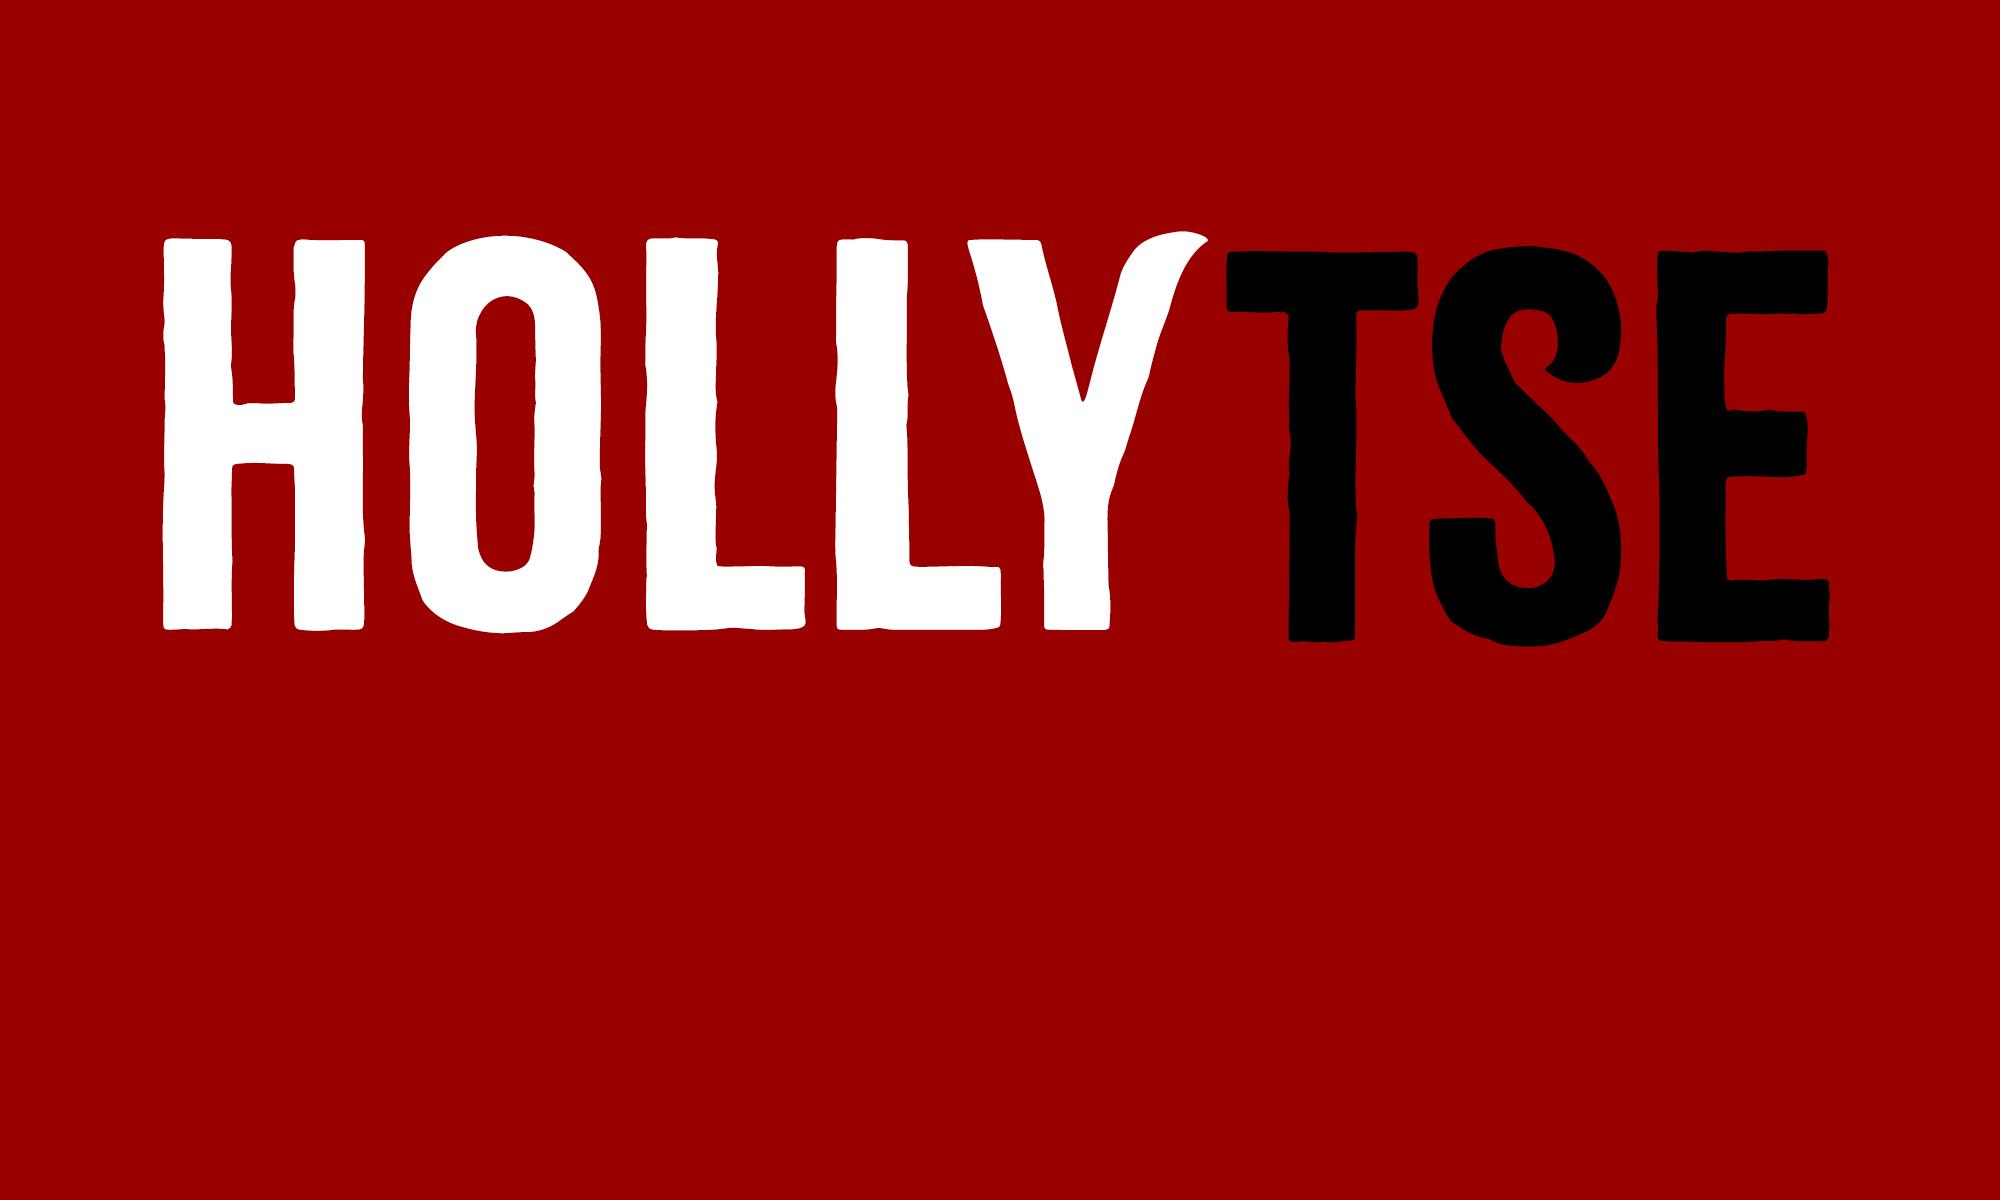 The Holly Tse Show